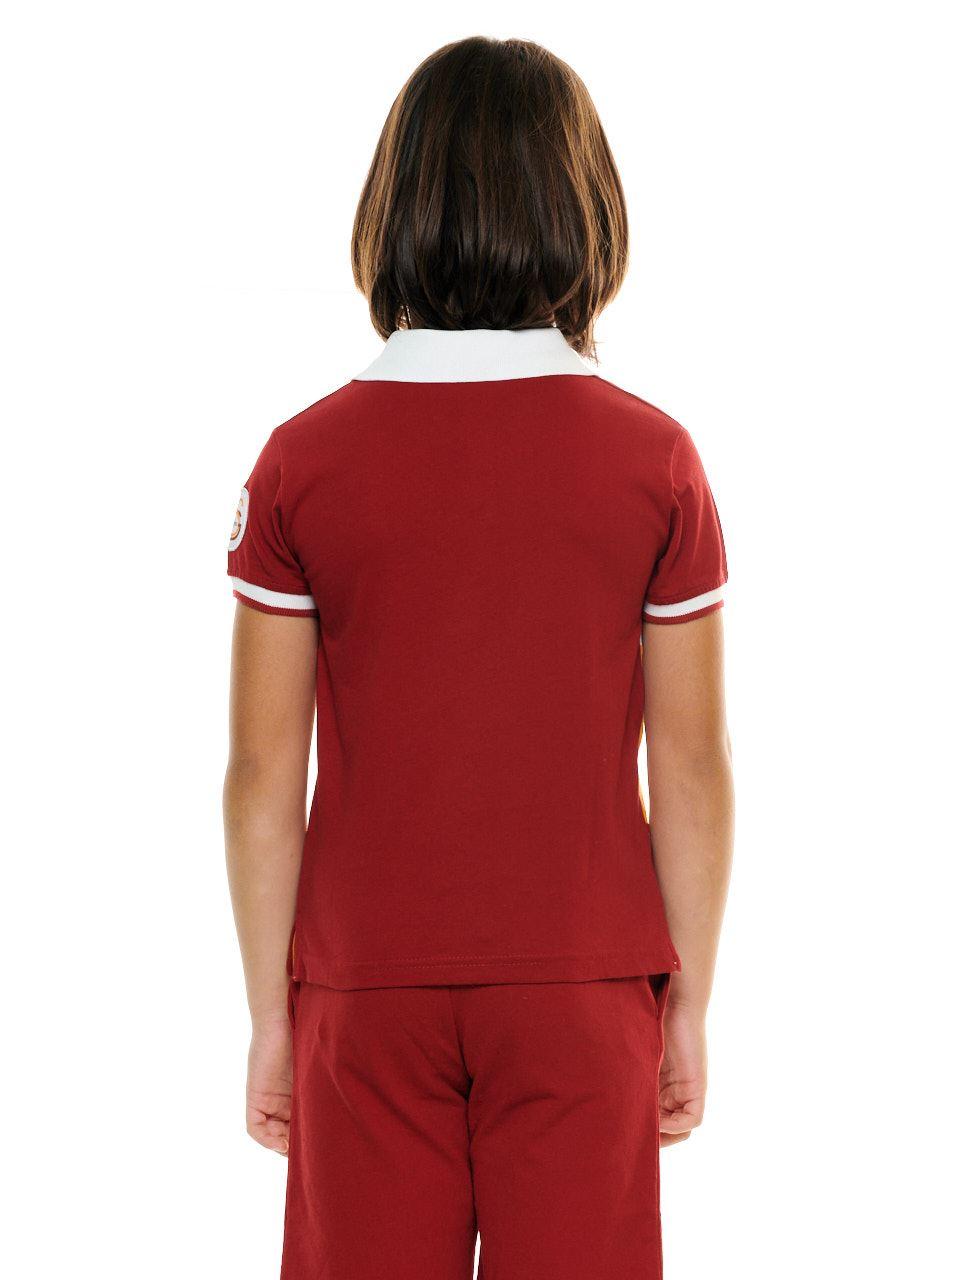 C21382 T-shirt Zb746